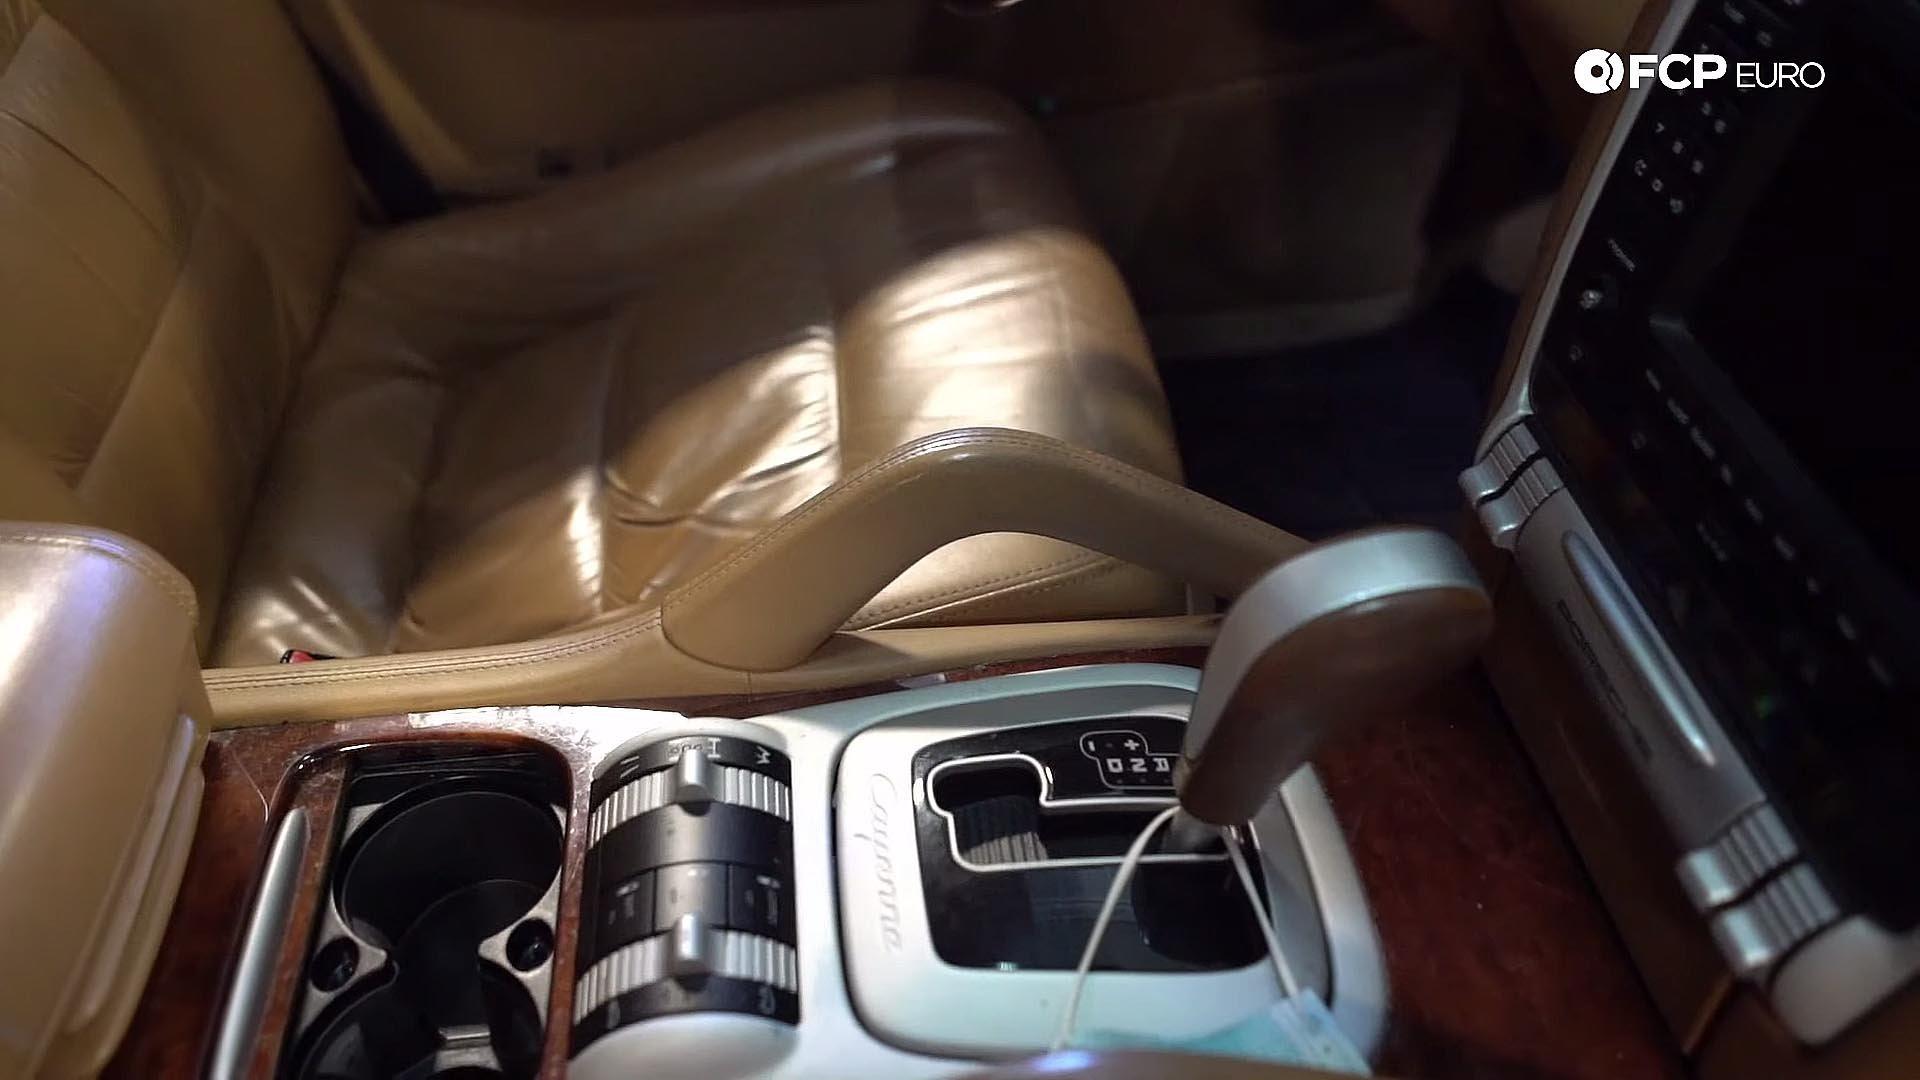 07_Porsche 955 Cayenne Turbo tan with wood trim worn